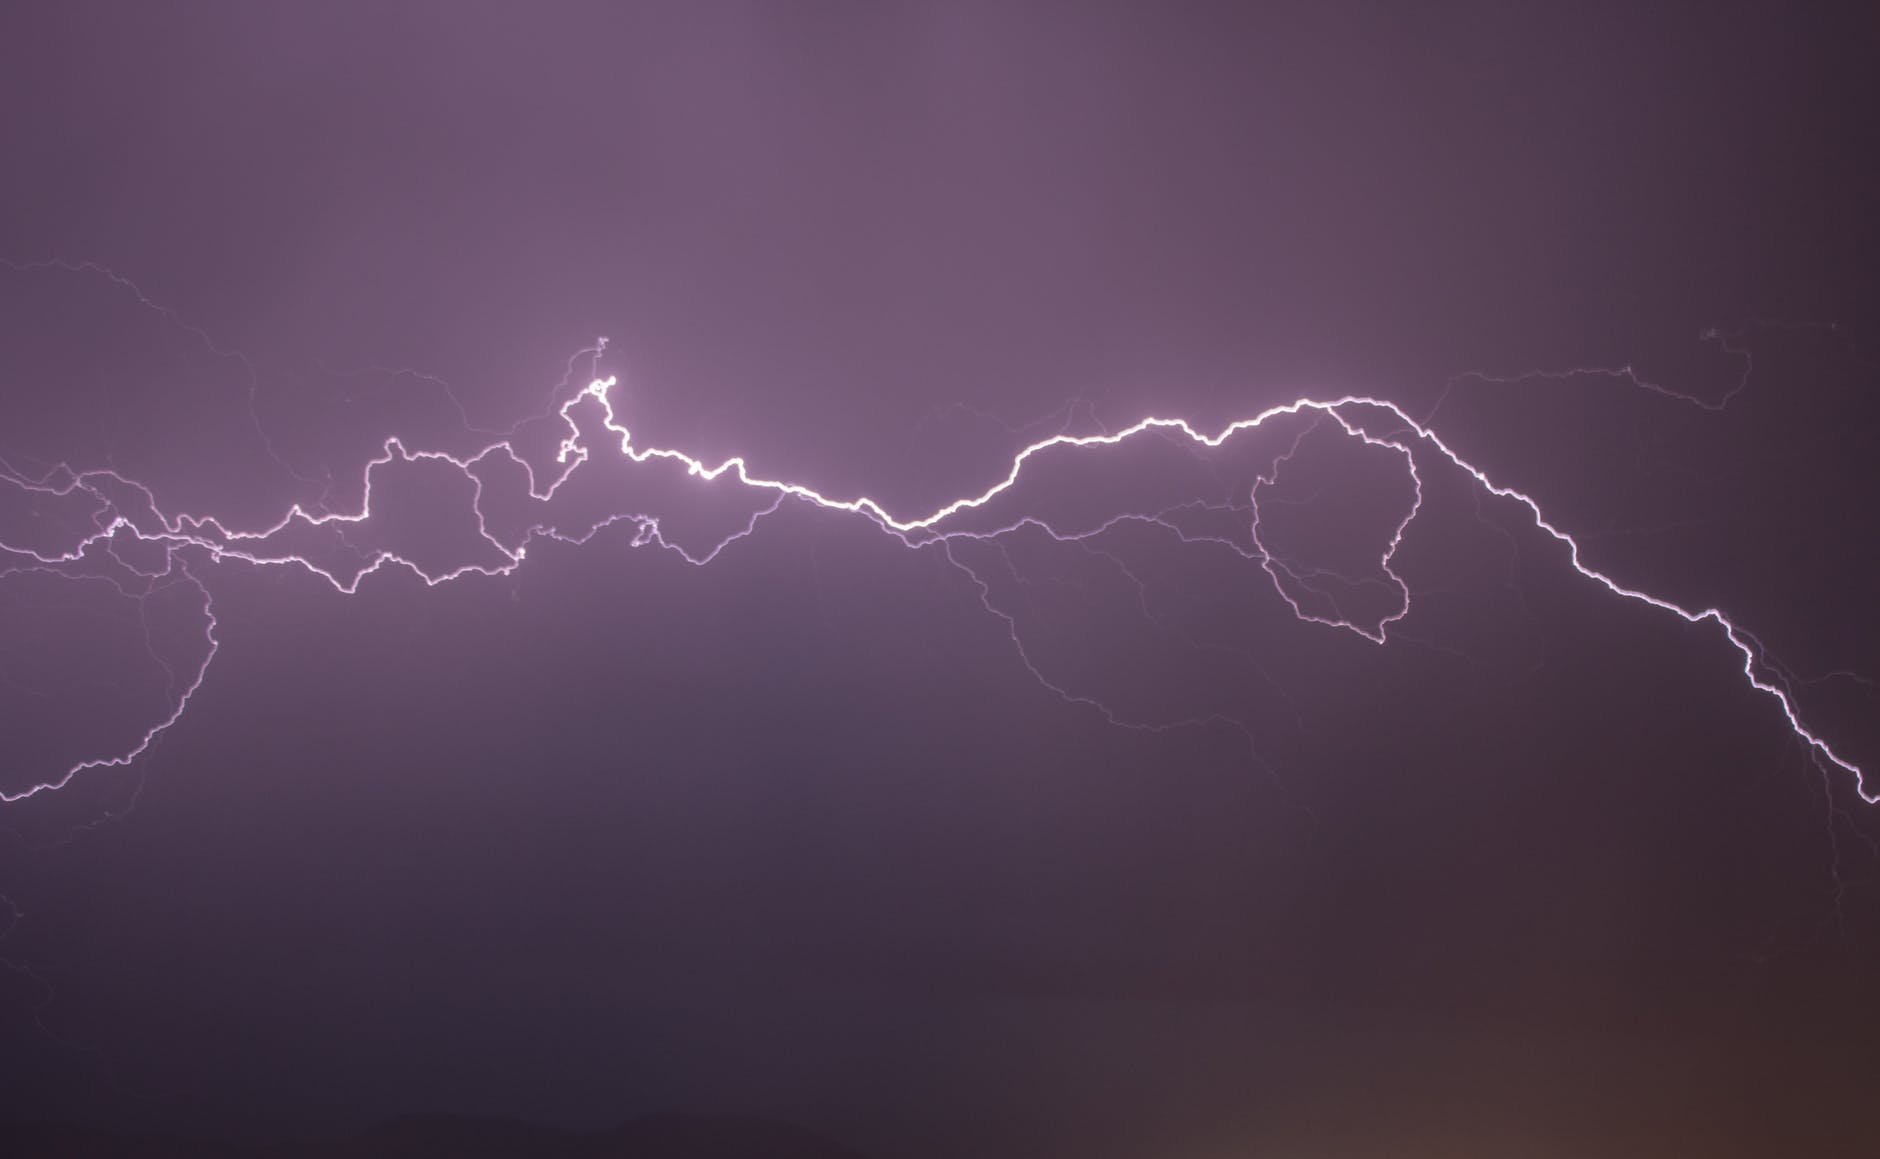 storm flash